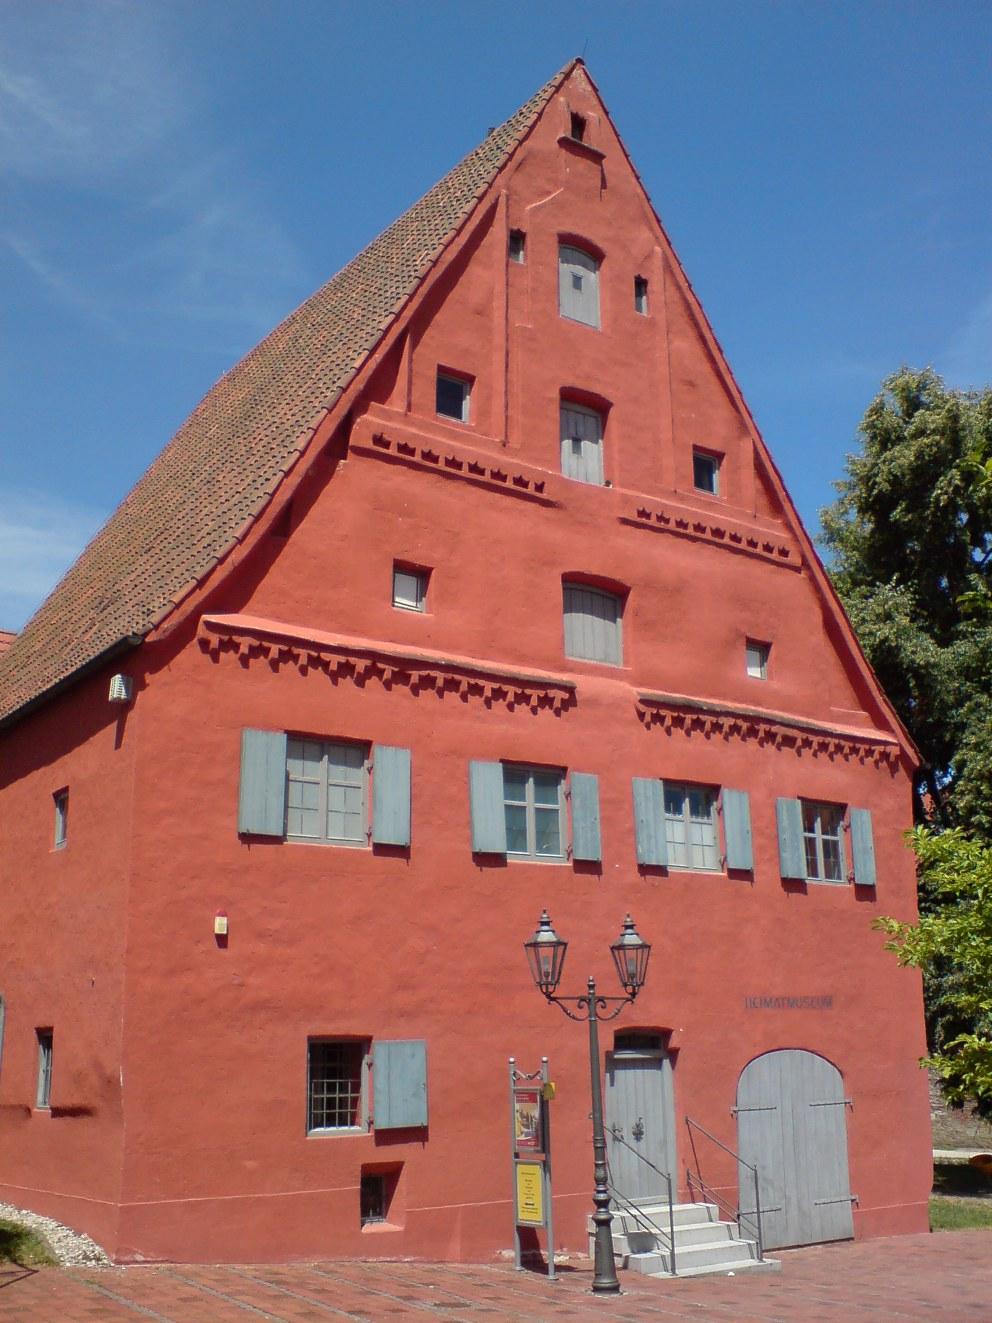 Küche Und Wohnkultur Donauwörth | Kuche U Wohnkultur Donauworth Logisting Com Varie Forme Di